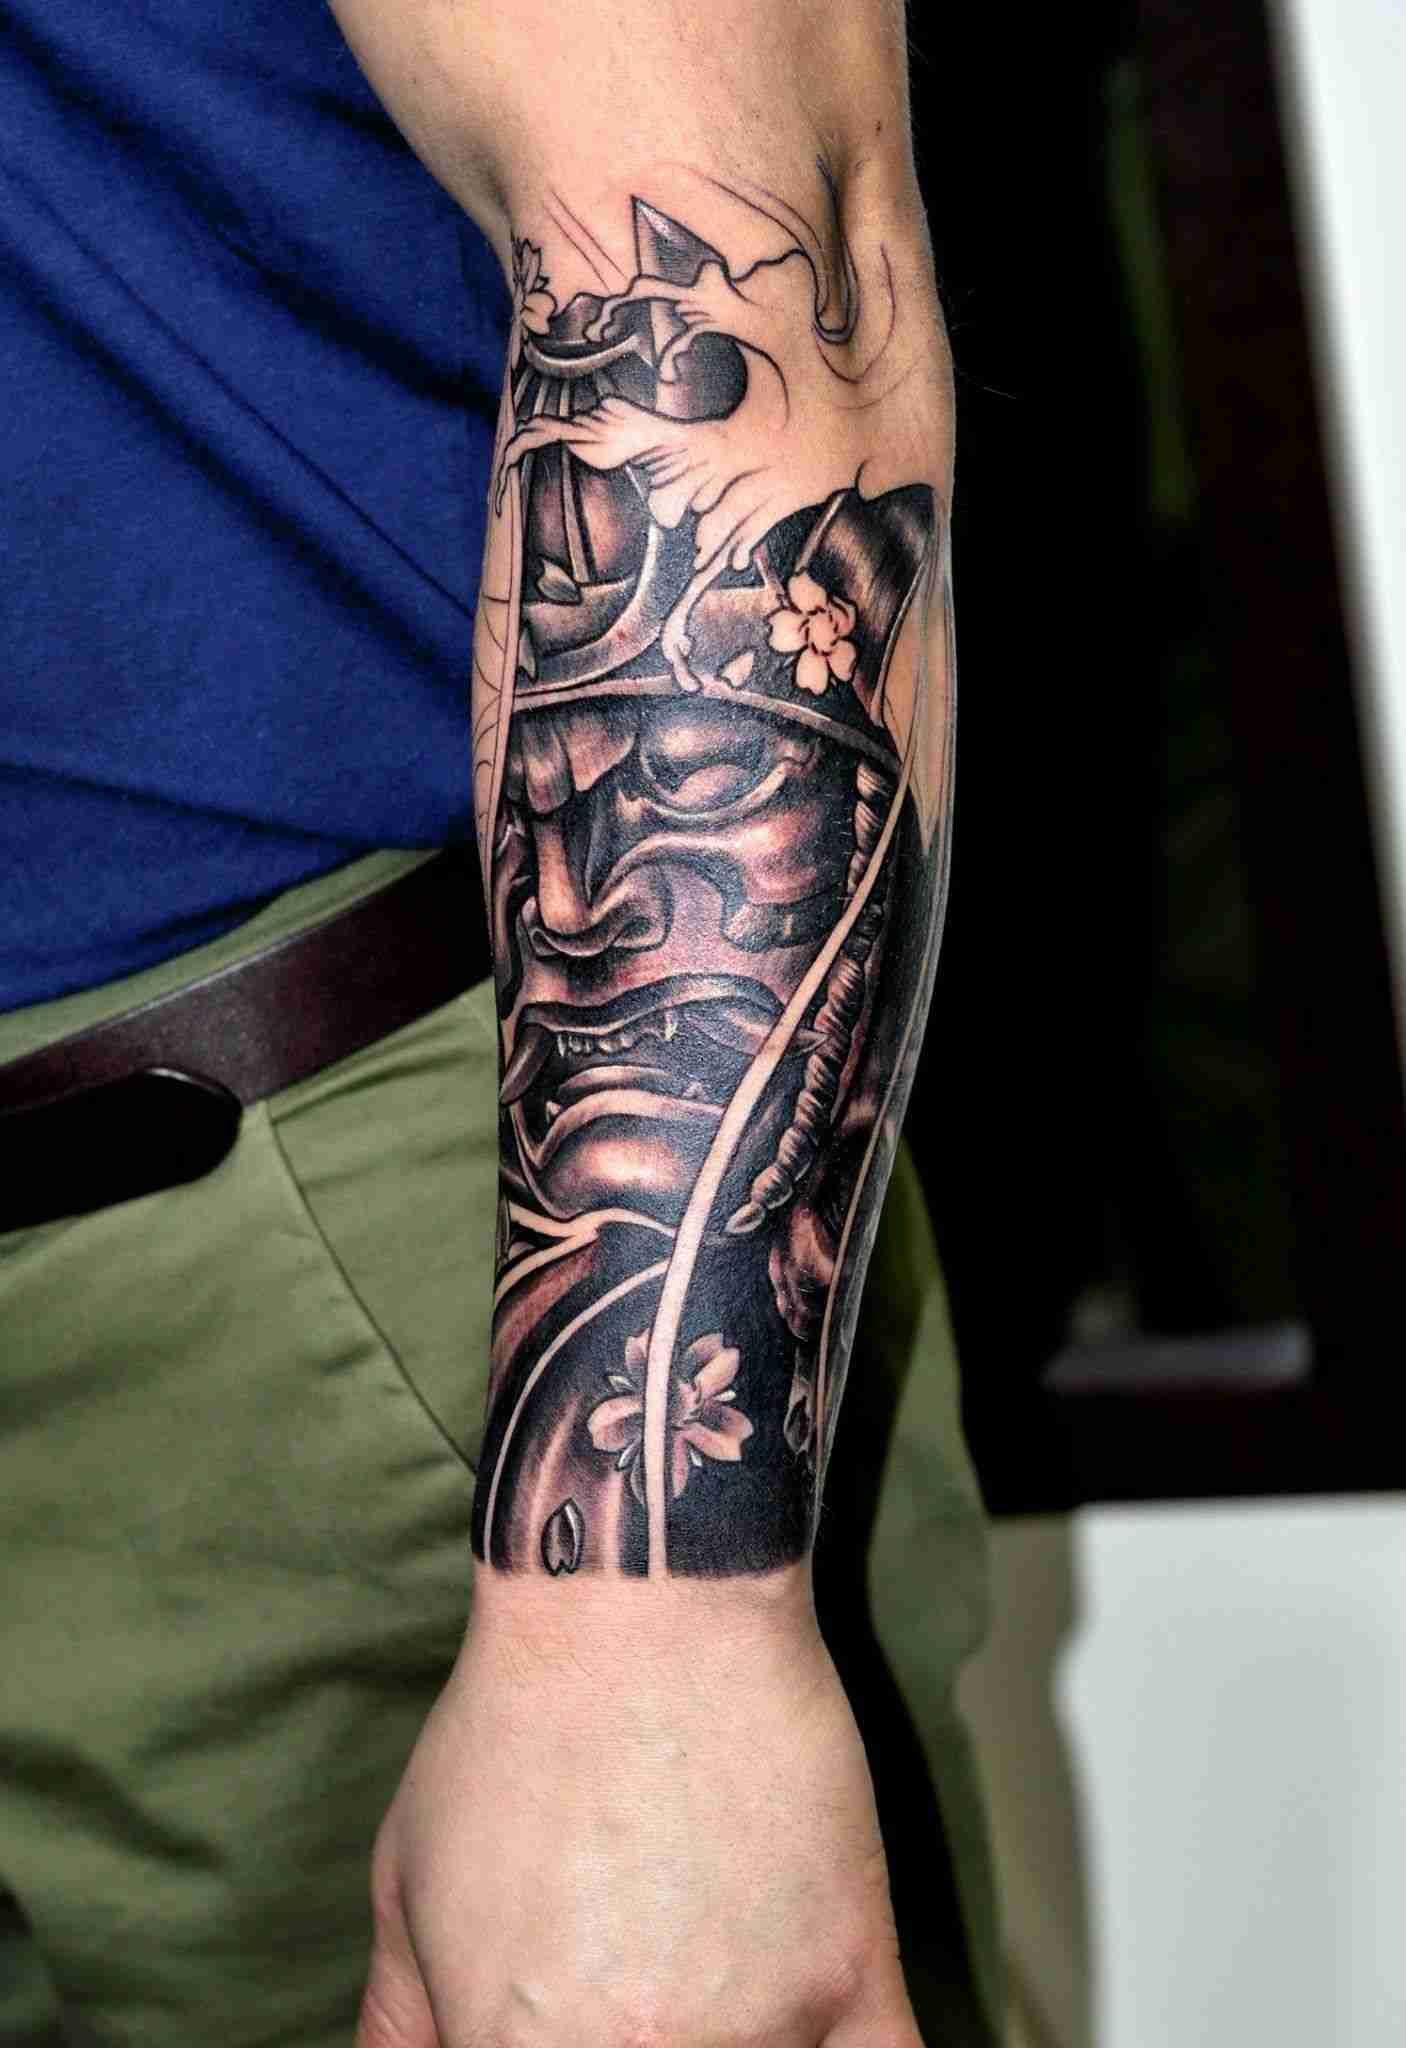 Tatouage Japonais Bras Signification Des Modeles Les Plus Populaires Tatuagem Tatuagem Dragao Tatuagens